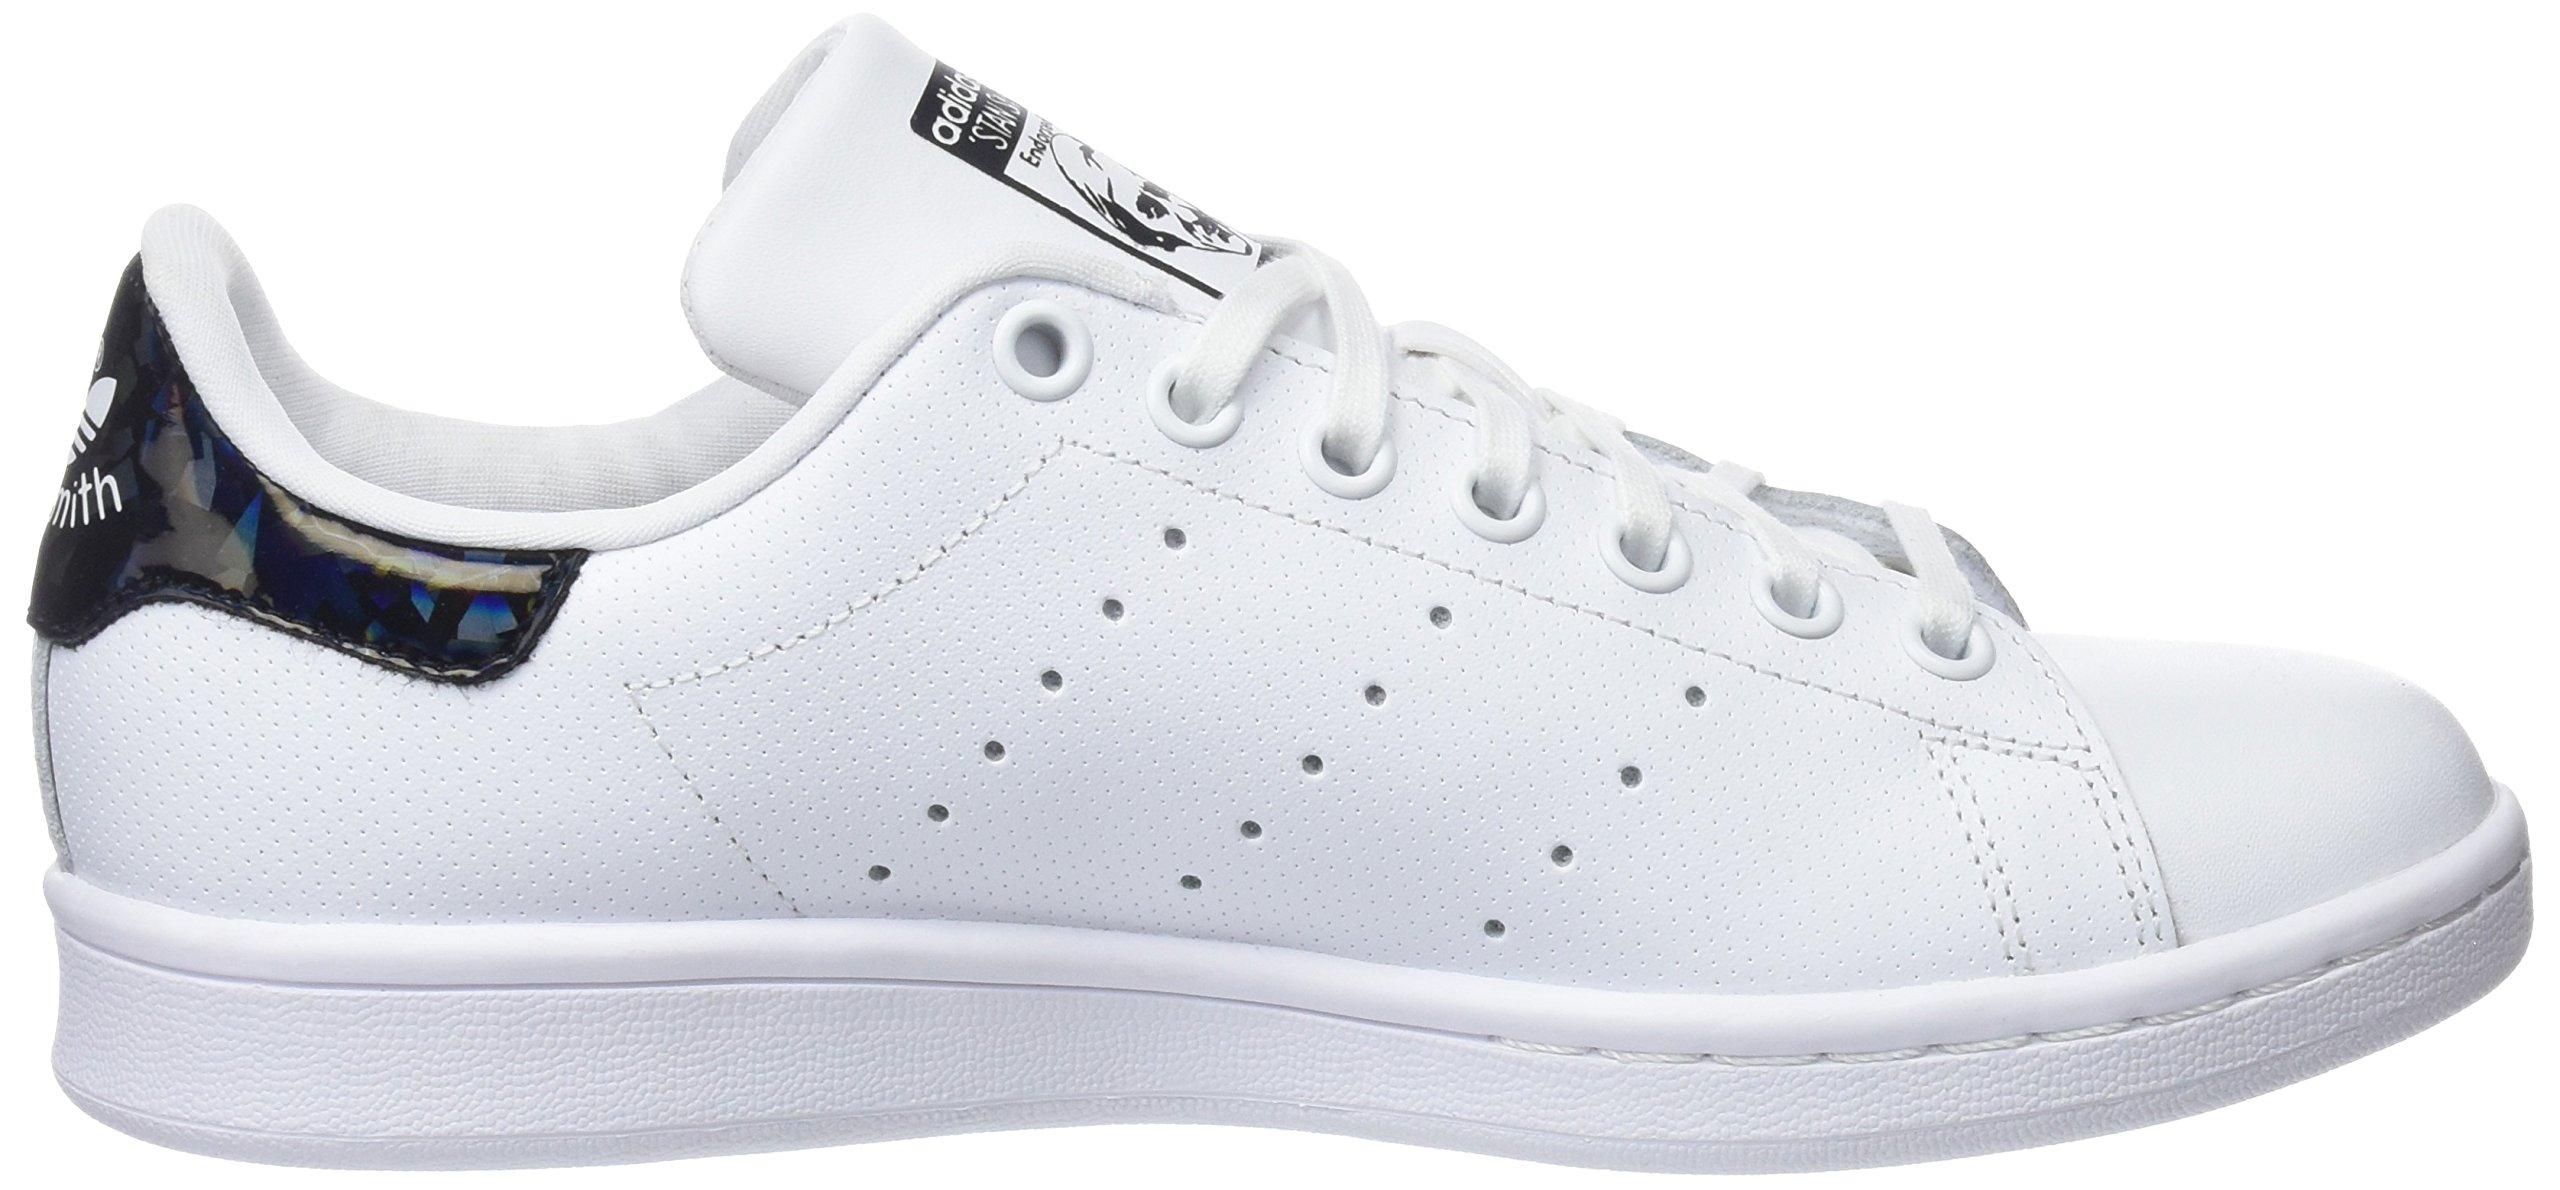 sports shoes e714c 89a9e http   www.prospectstrainingcenter.com cebfcruhrvzw-9246401 https ...